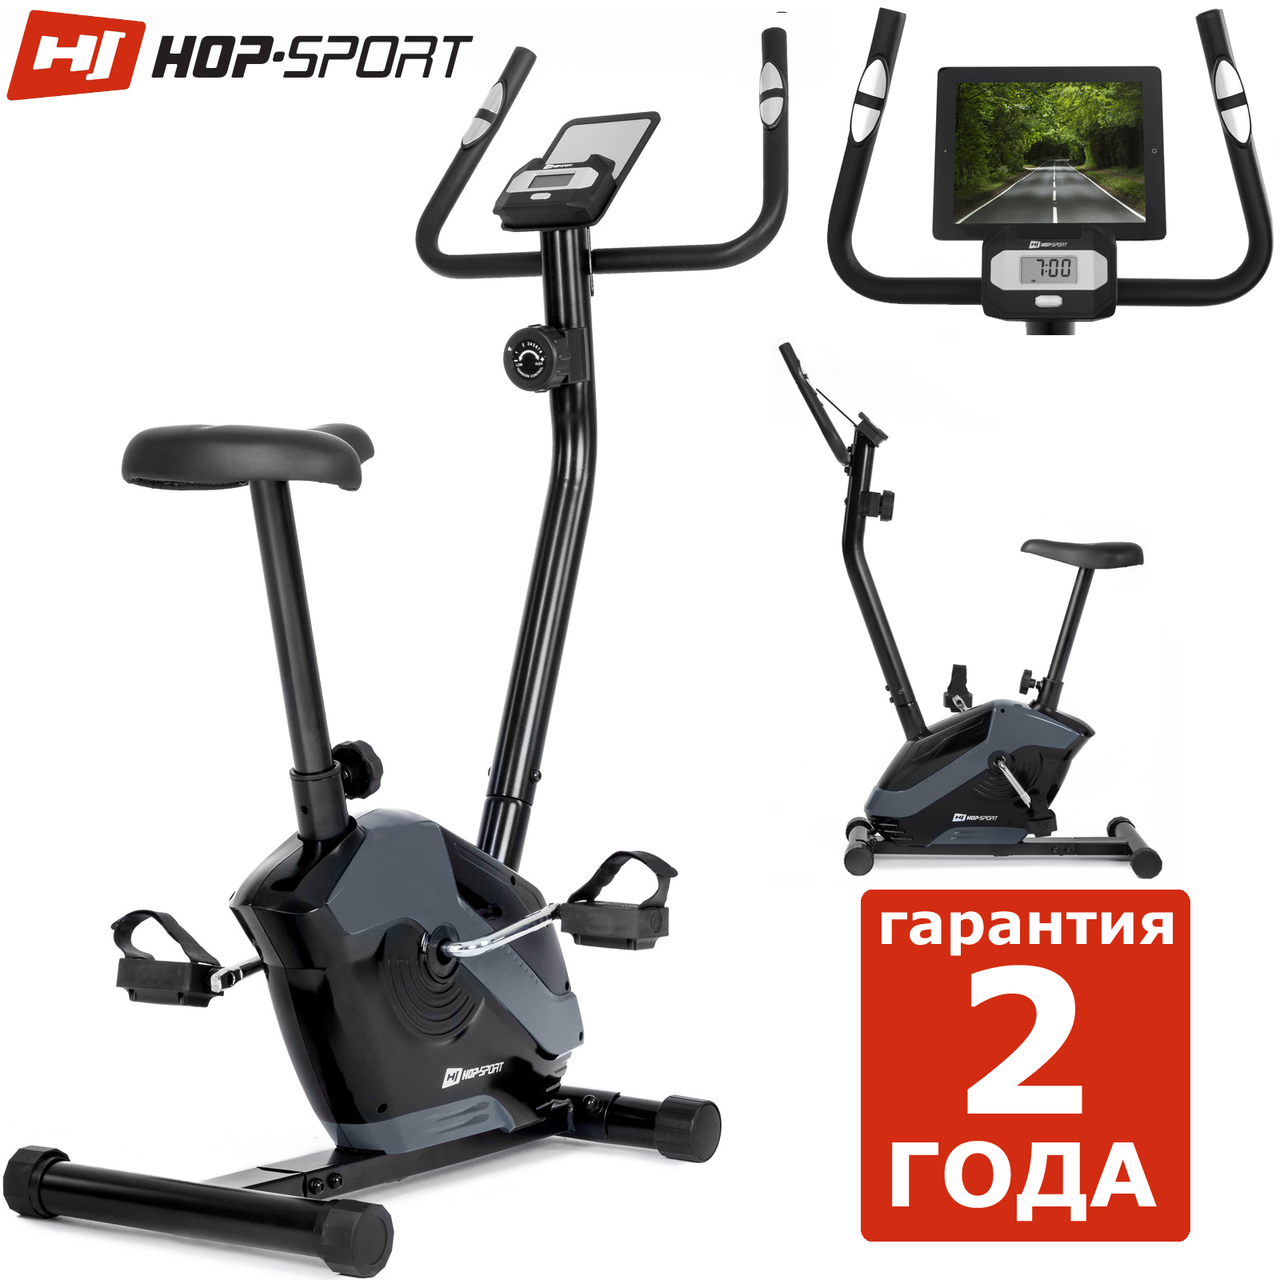 Hop-Sport / Тренажер велотренажер HS-045H Eos grey